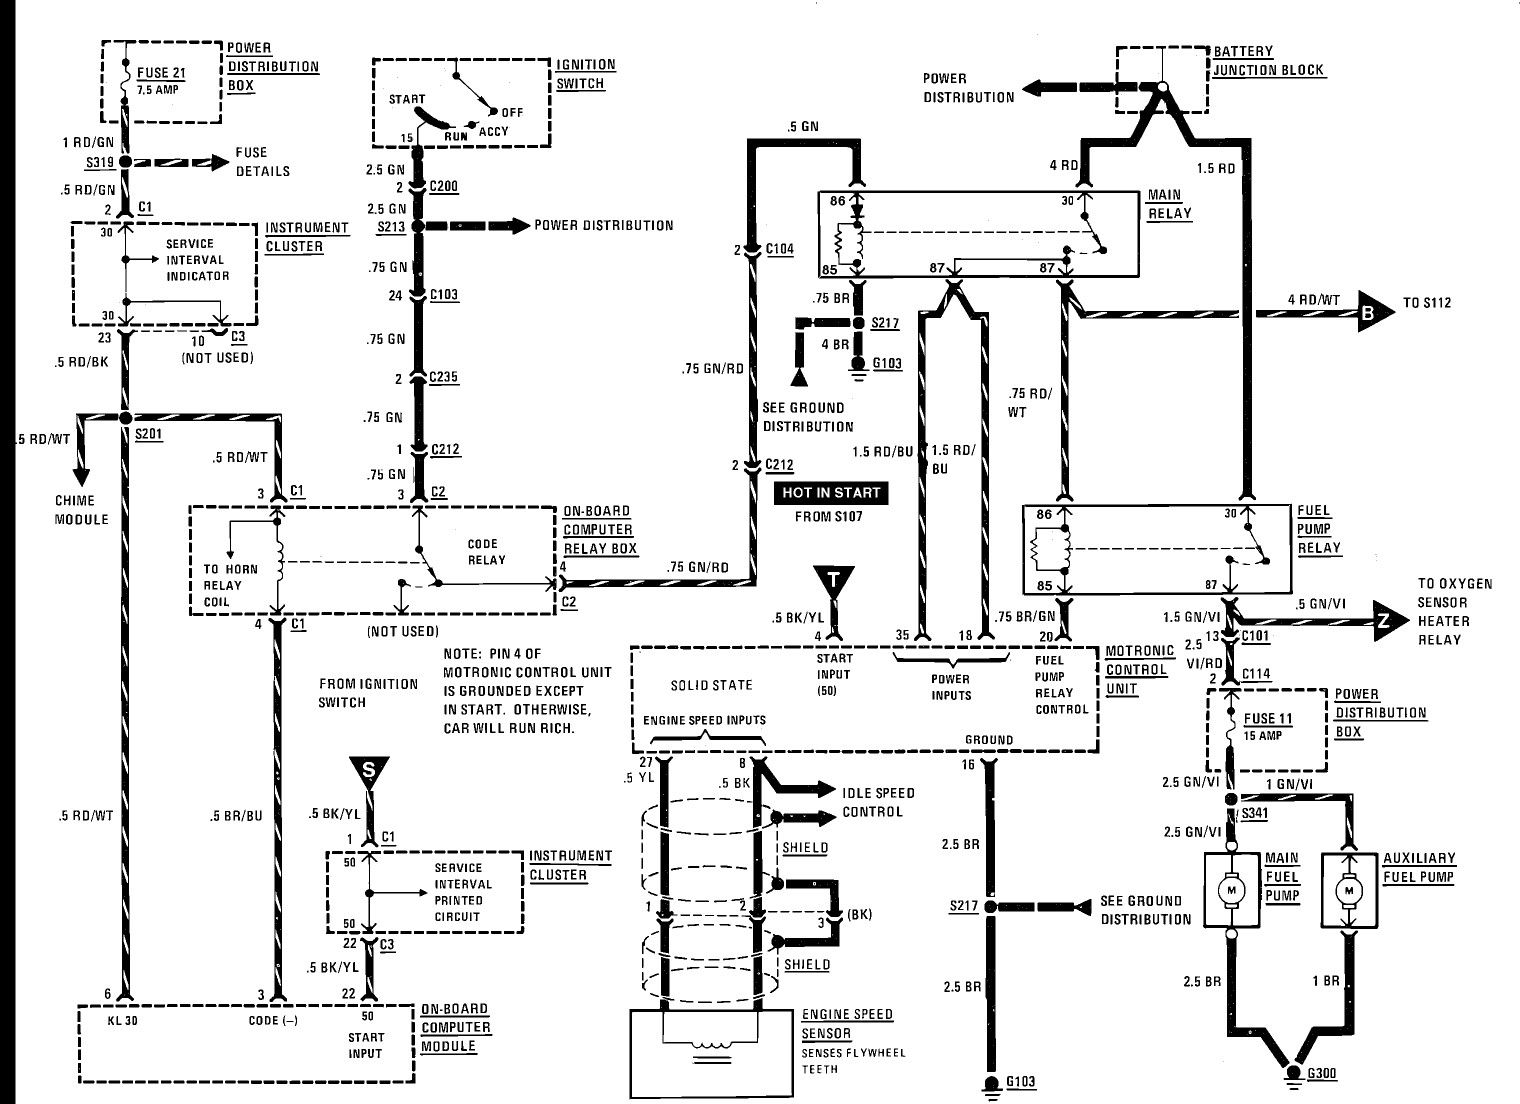 bmw x5 wiring diagram 3 bmw x5 e53 3d pinterest bmw bmw x5 i rh pinterest com bmw x5 stereo wiring diagram bmw x5 trailer wiring diagram [ 1520 x 1104 Pixel ]